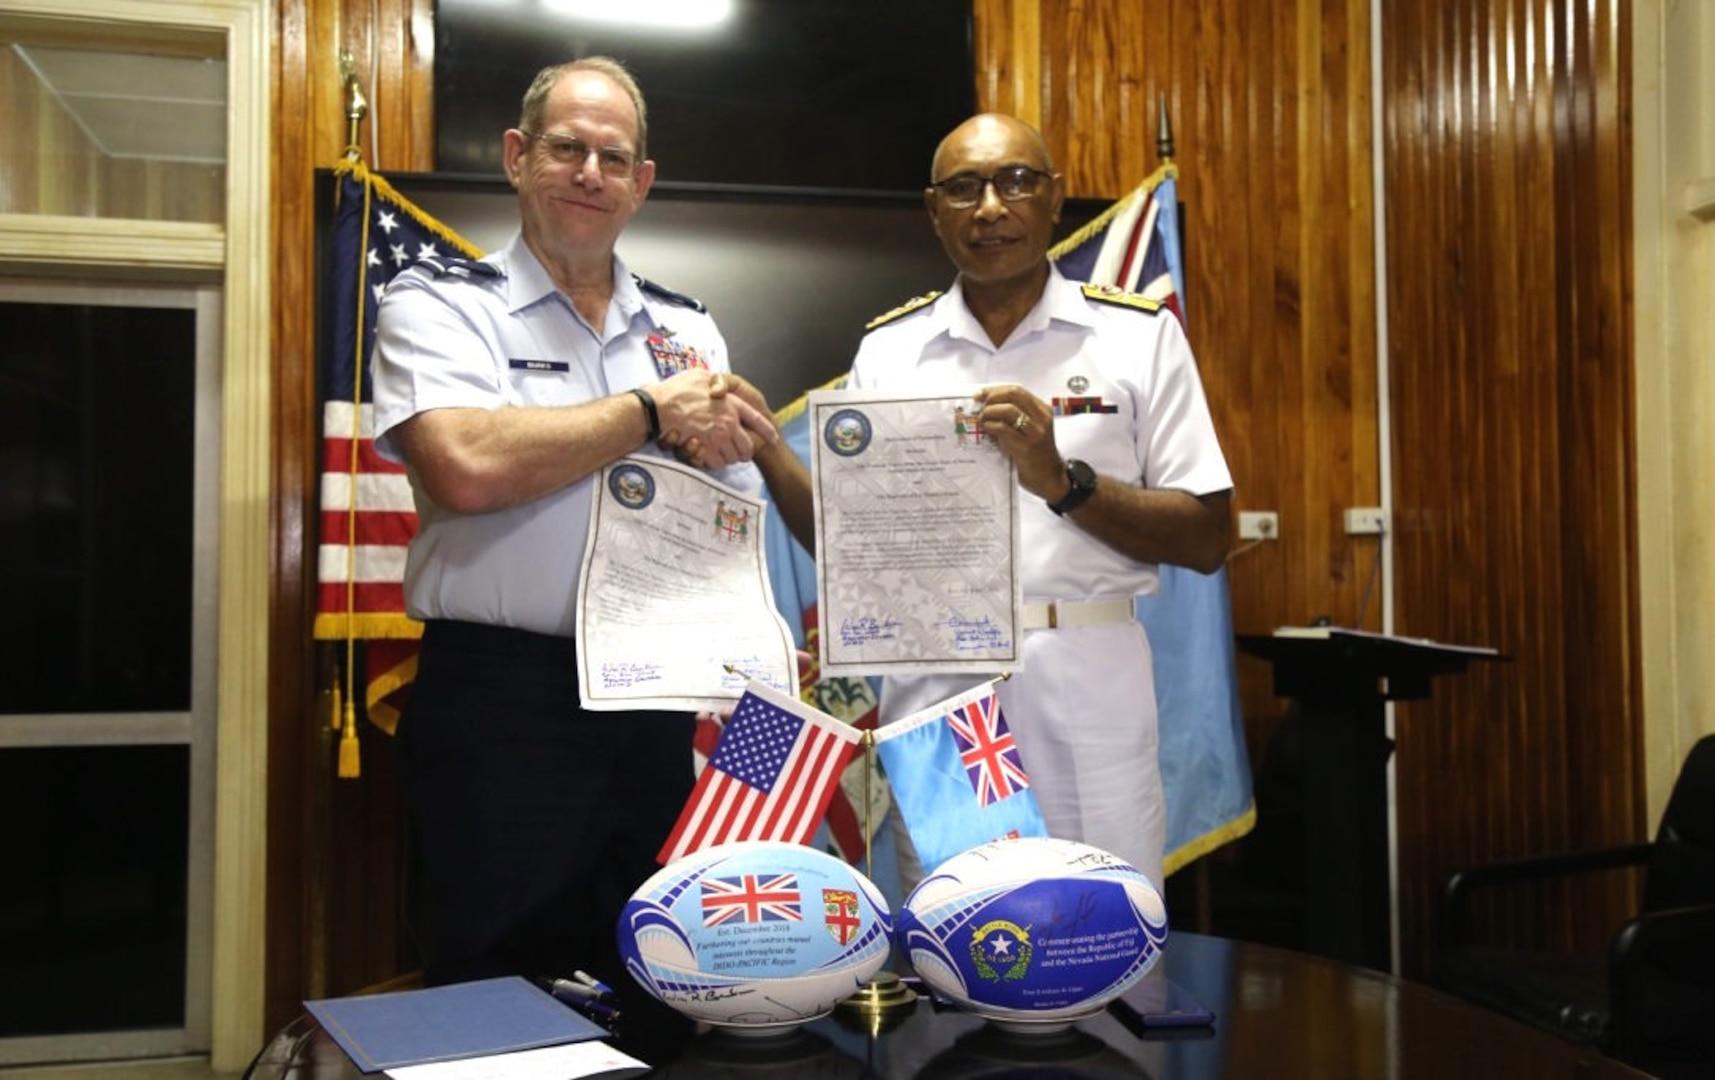 Republic of Fiji; Nevada Guard to Expand Oceania Partnership